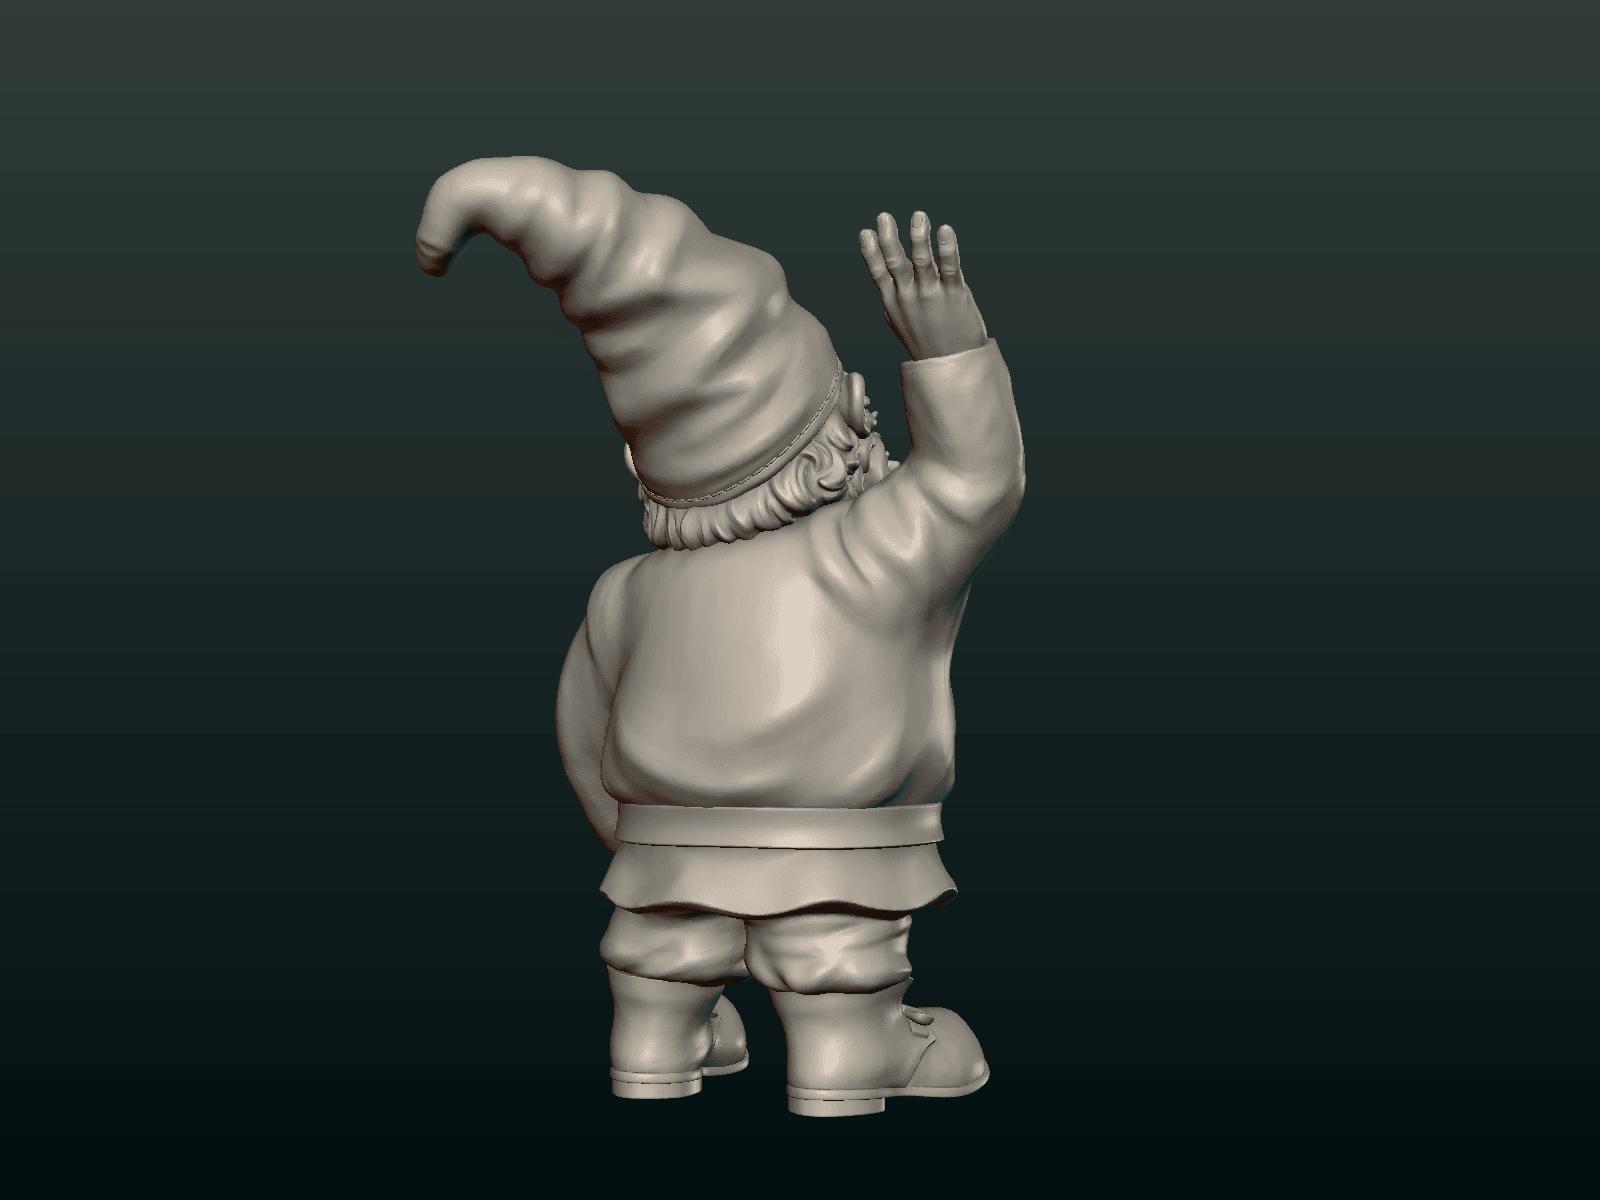 Garden_Gnome-07.png Download STL file Garden Gnome • 3D printing design, Skazok